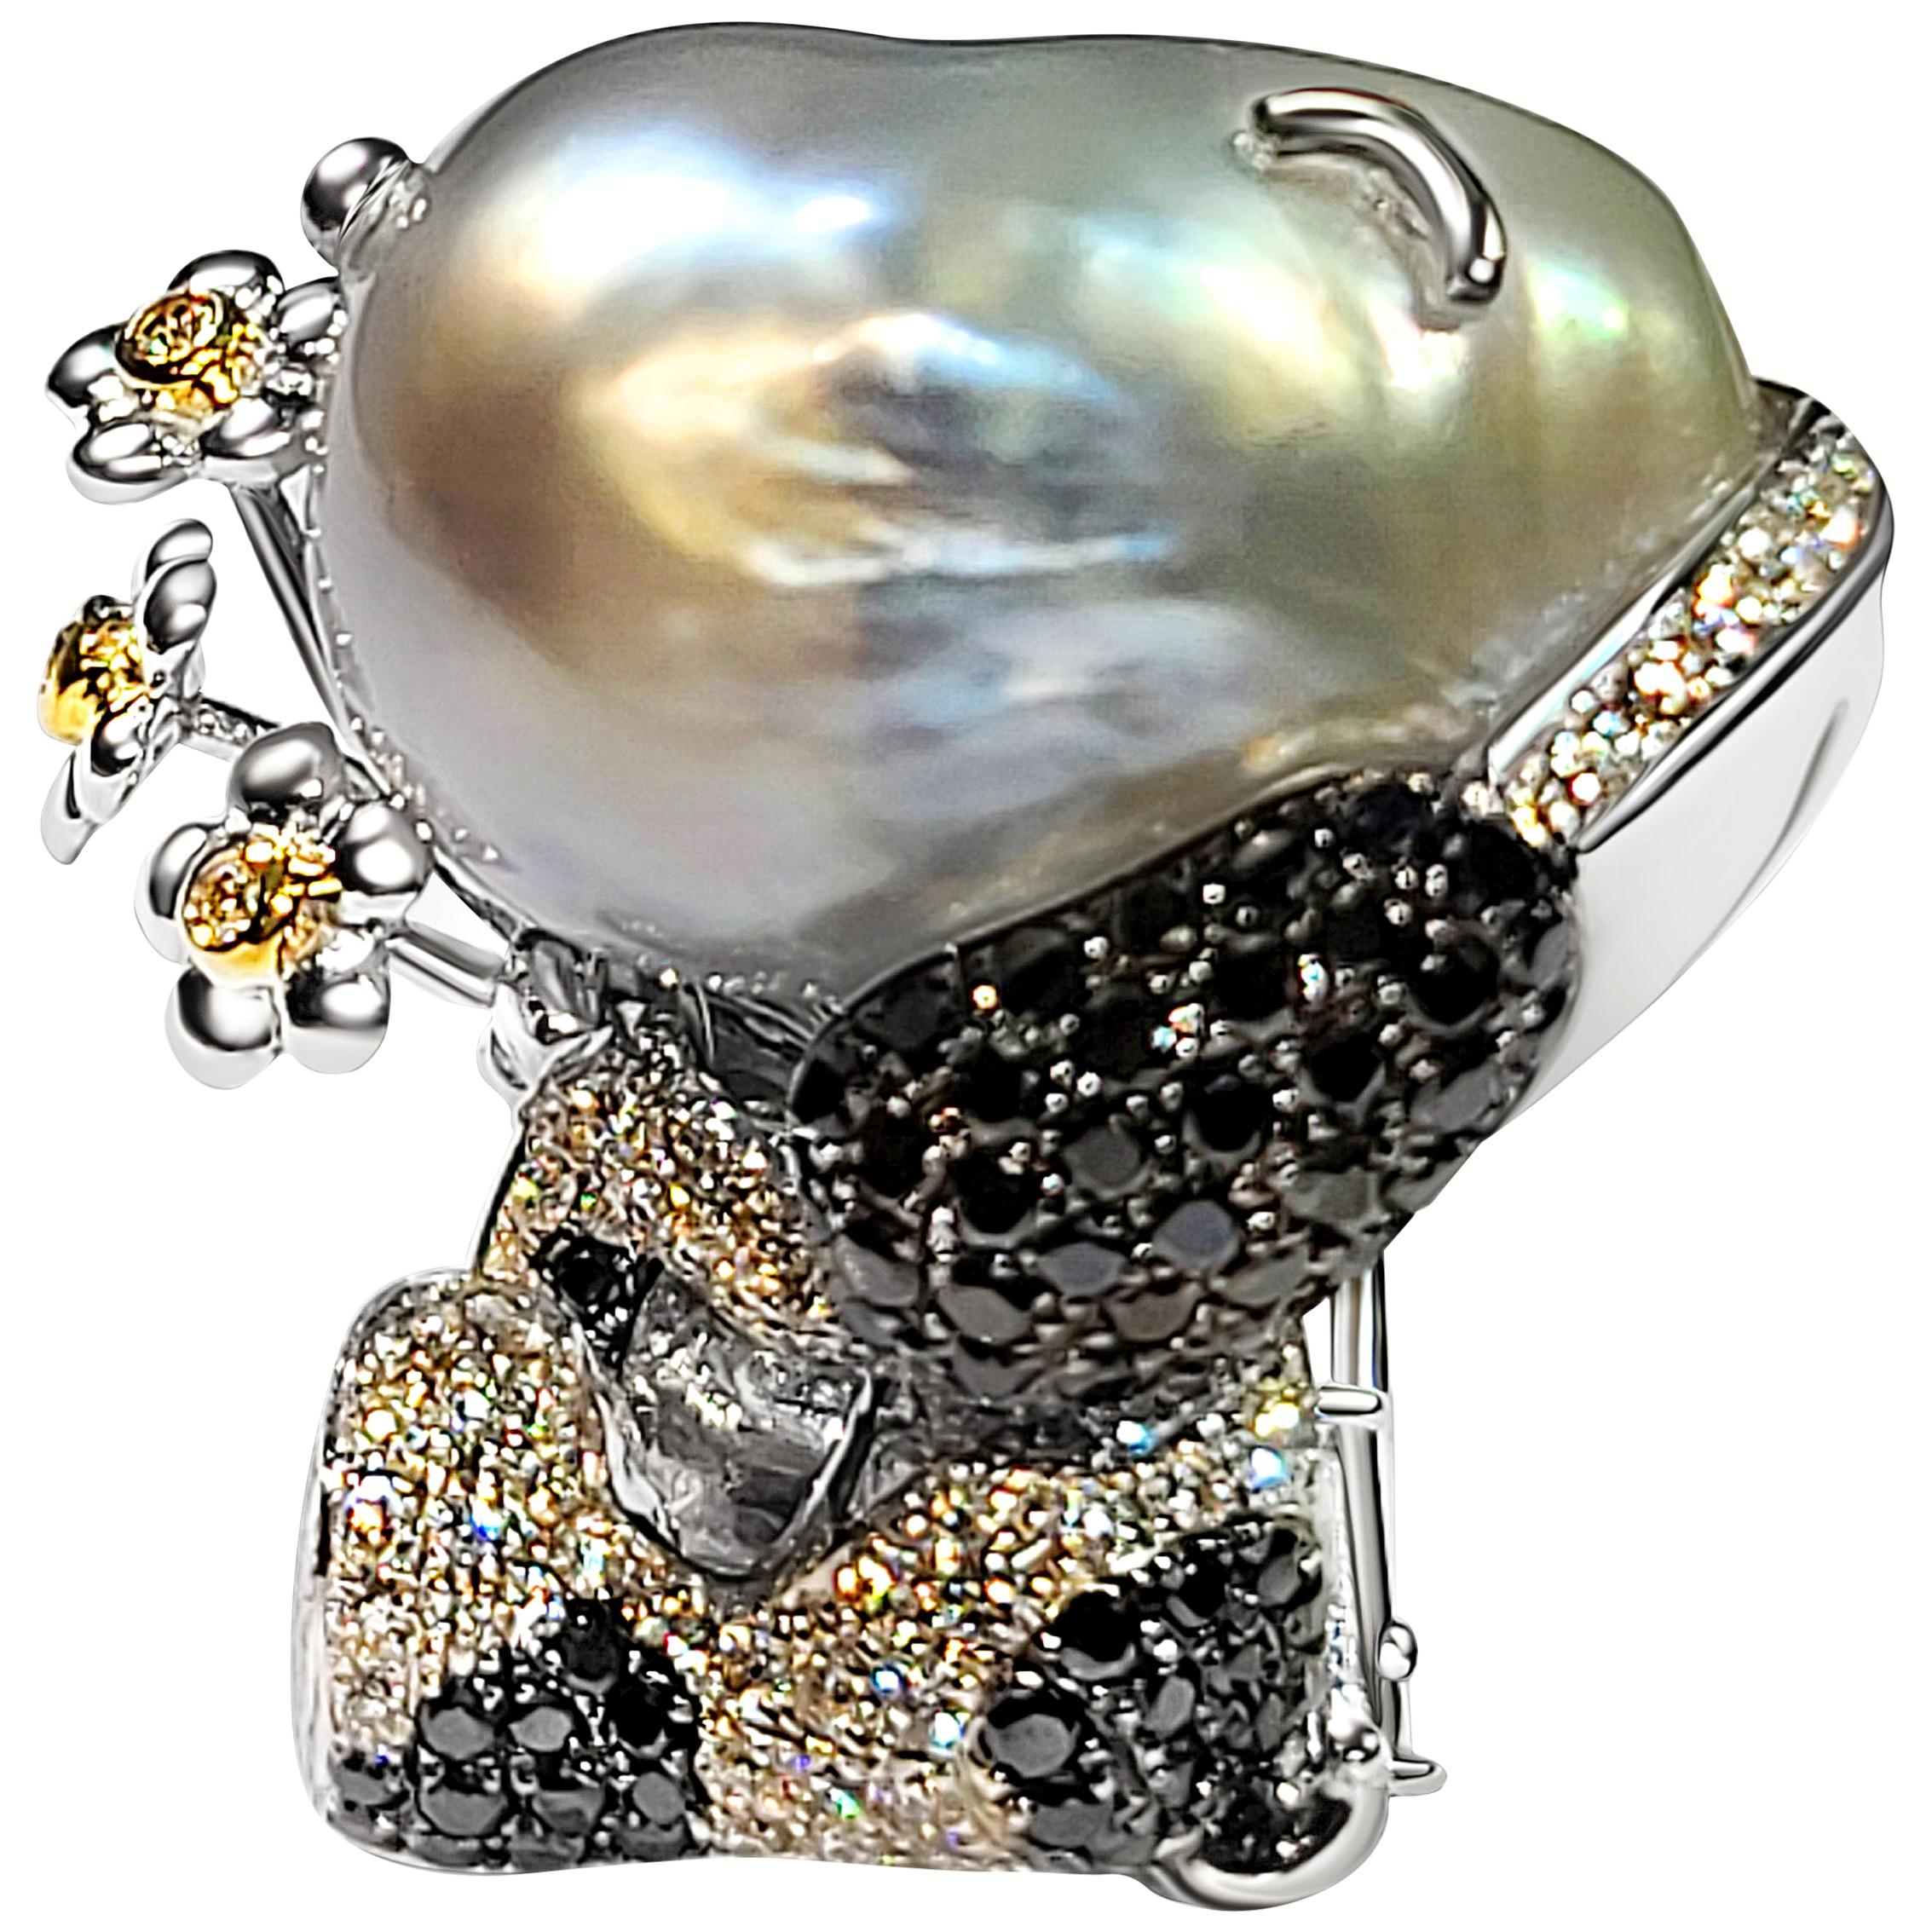 18 Karat White Gold Pearl and Diamond Pendant Brooch